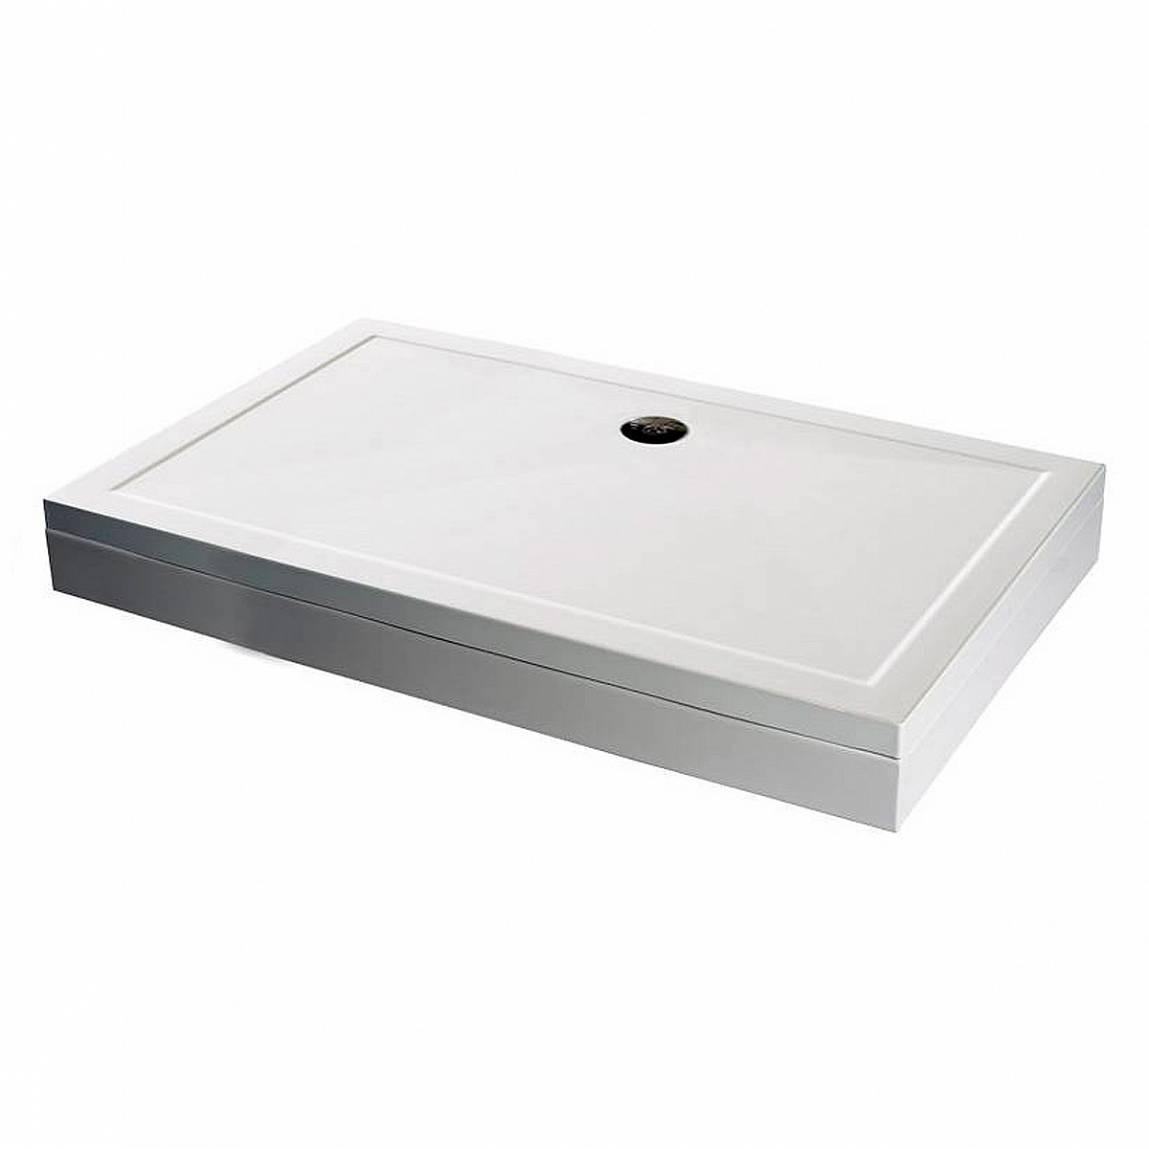 Image of Rectangular Stone Shower Tray & Riser Kit 900 x 800